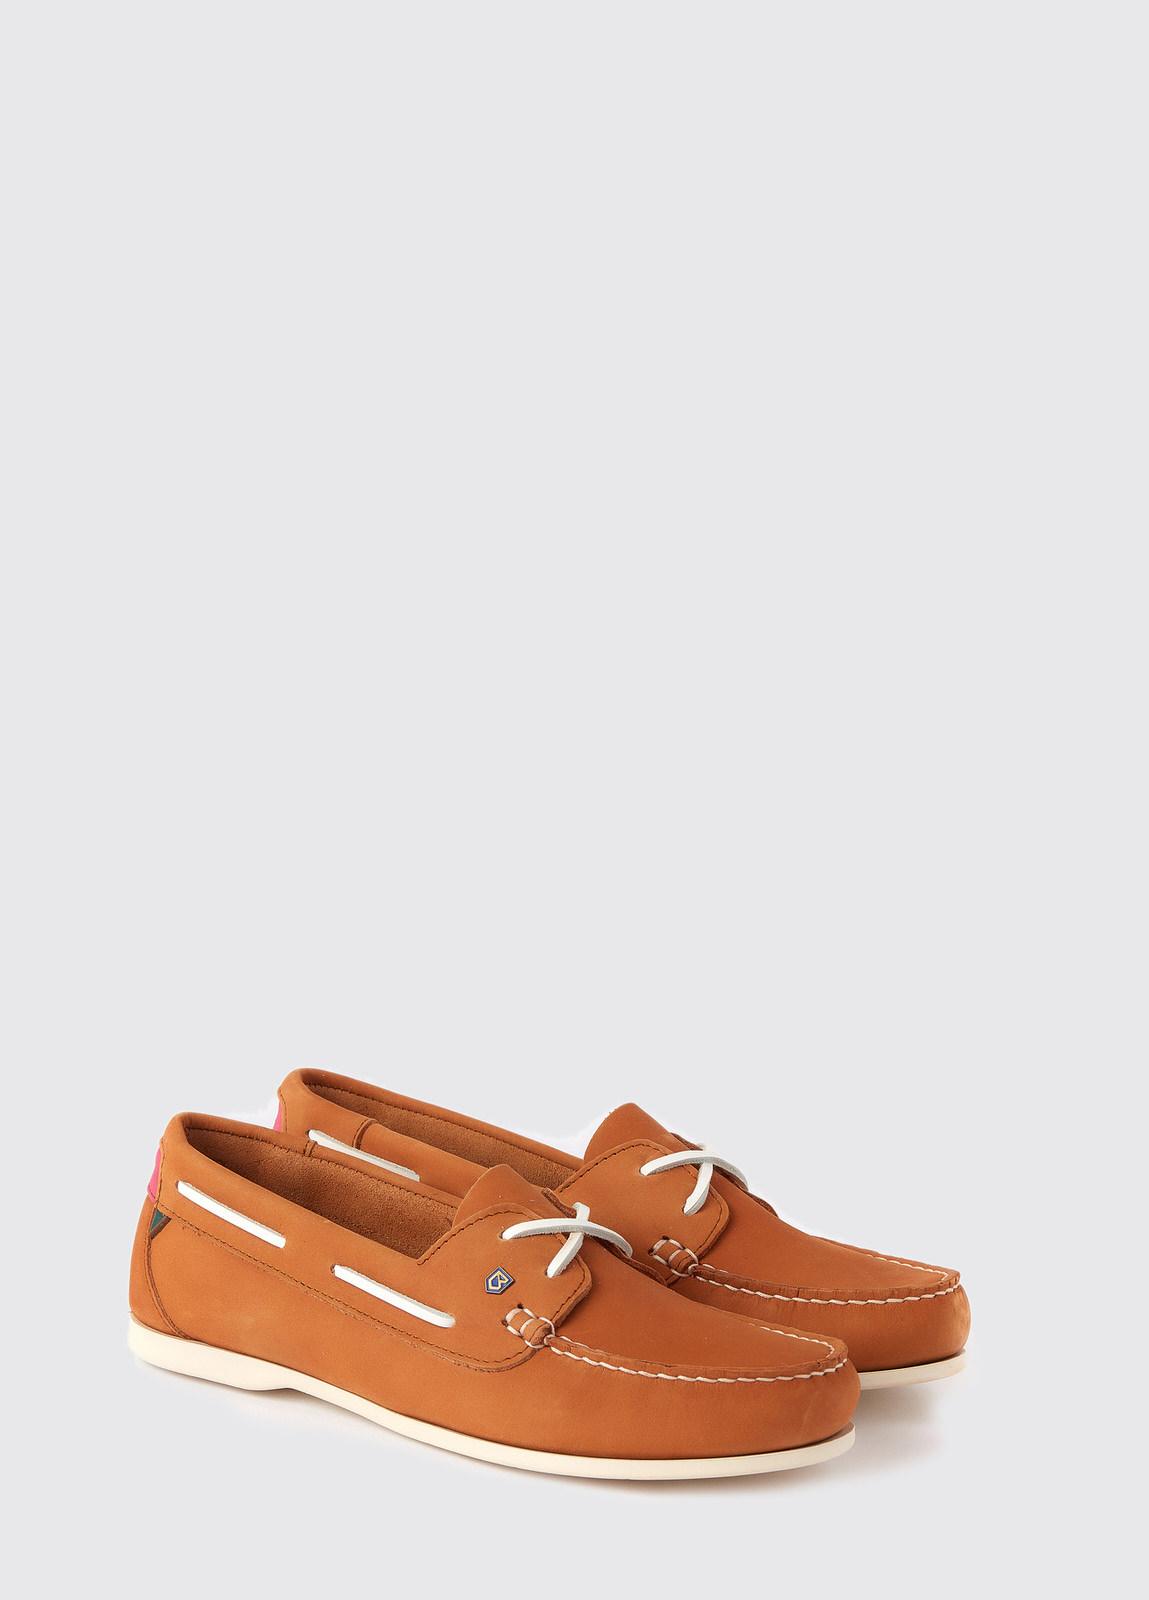 Aruba Deck Shoe - Caramel